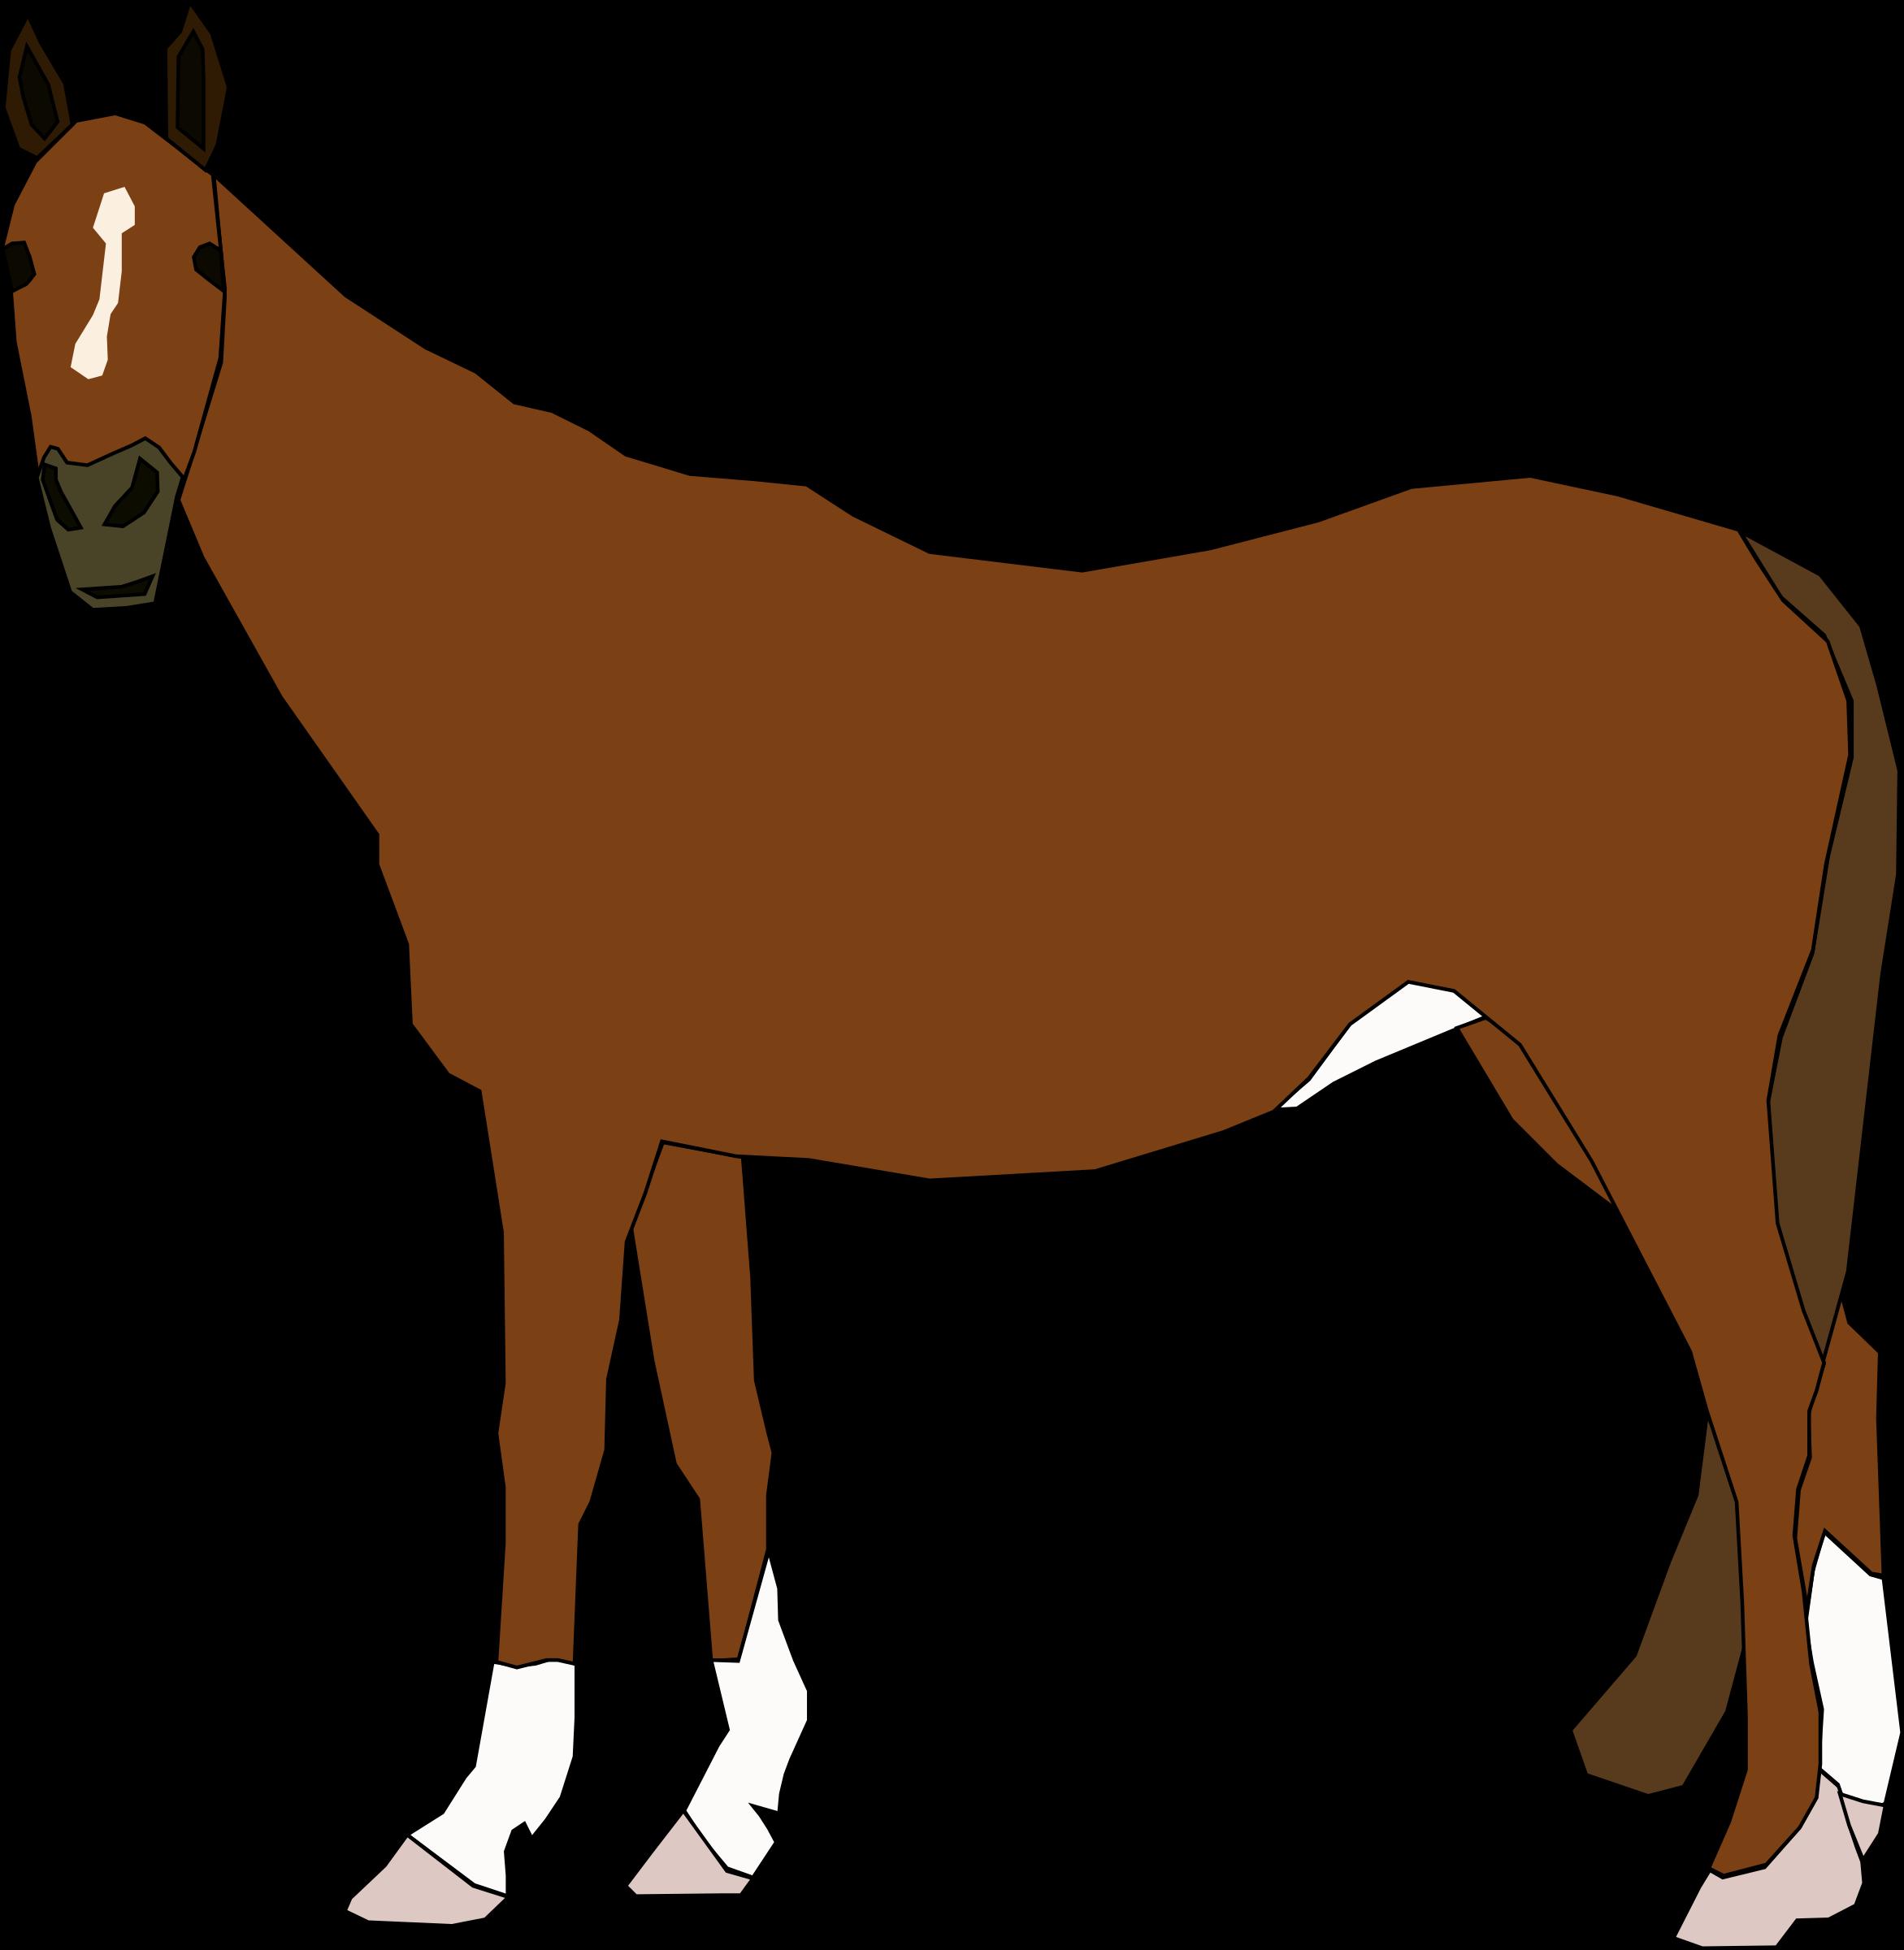 chestnut horse vector clipart image free stock photo public rh goodfreephotos com horse vector art horse vector art pack